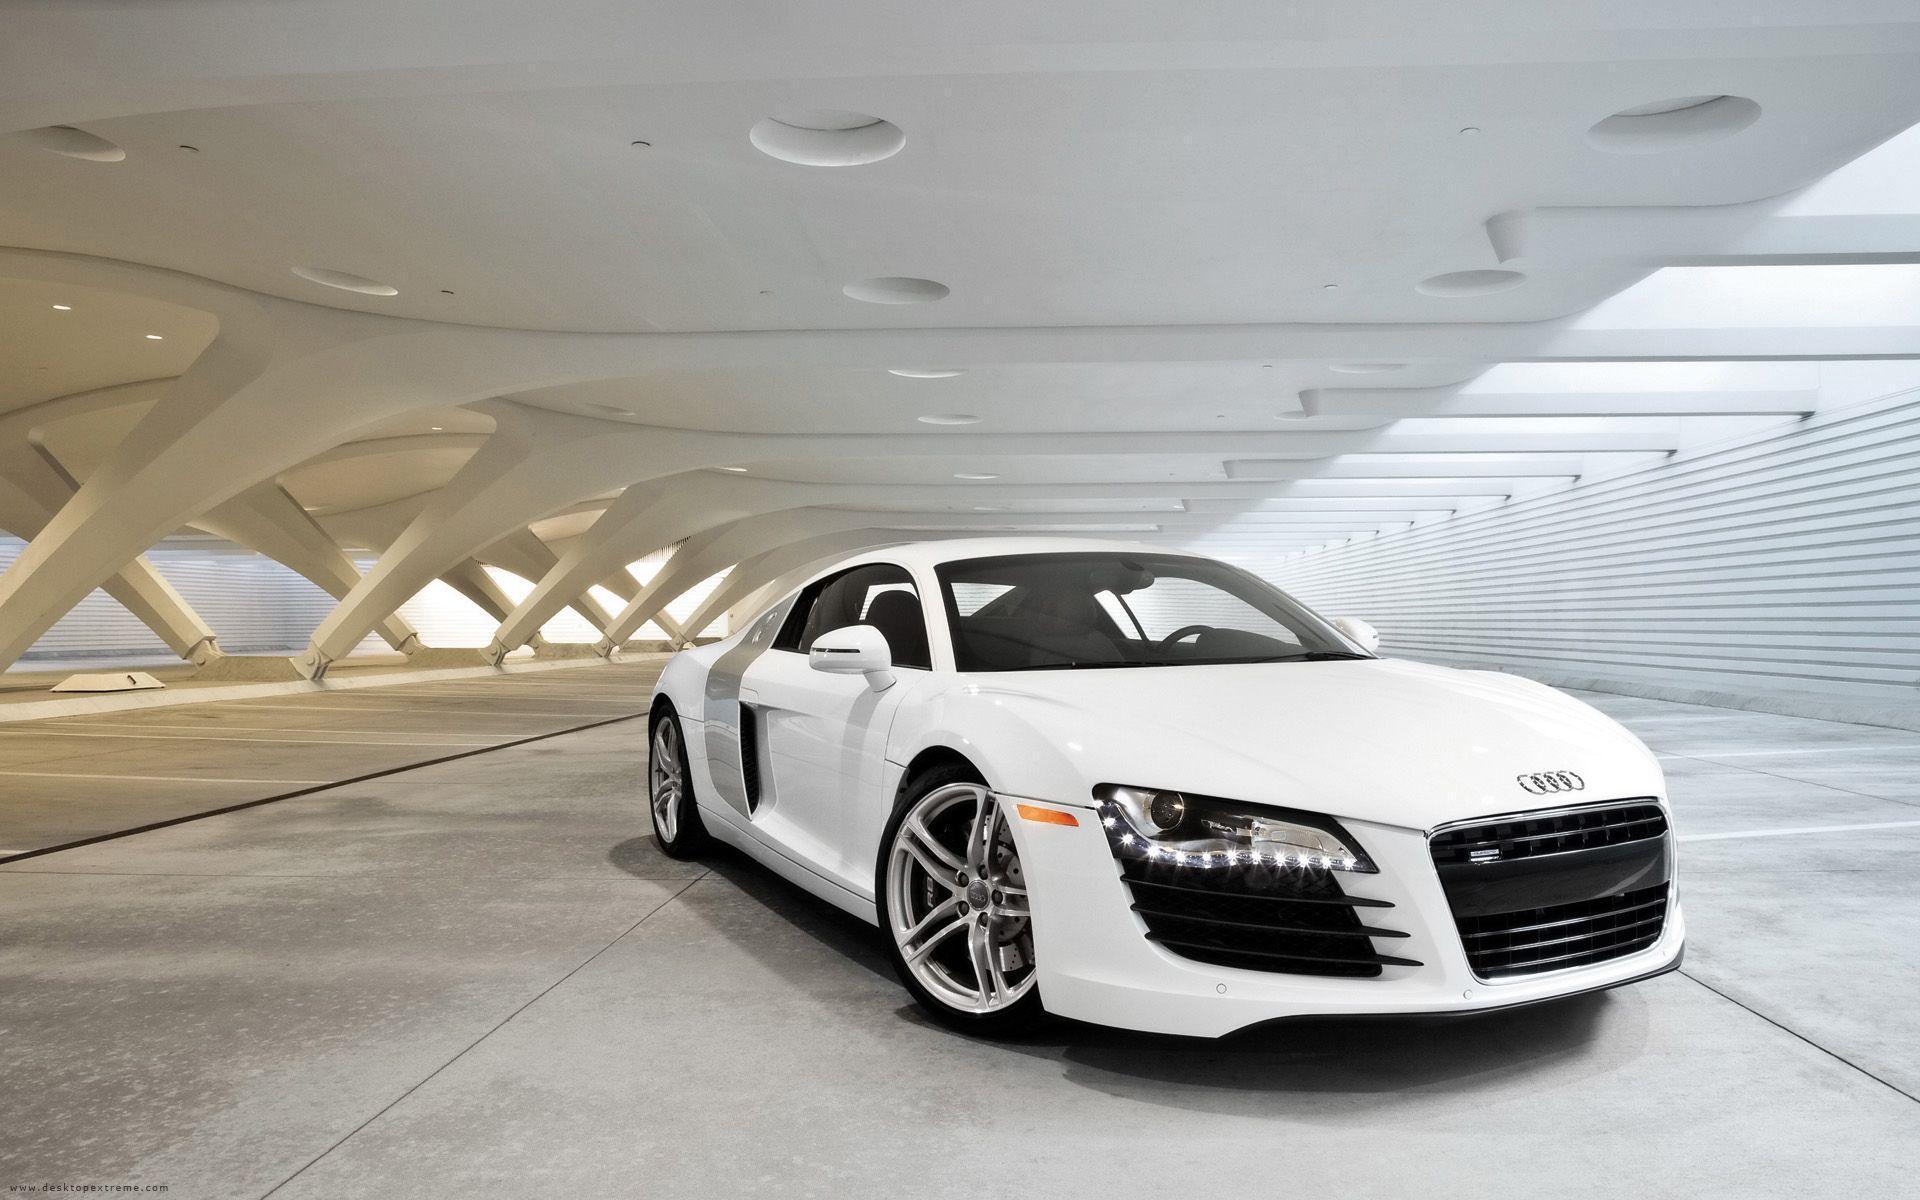 Wallpapers For Audi R8 Wallpaper Hd Widescreen